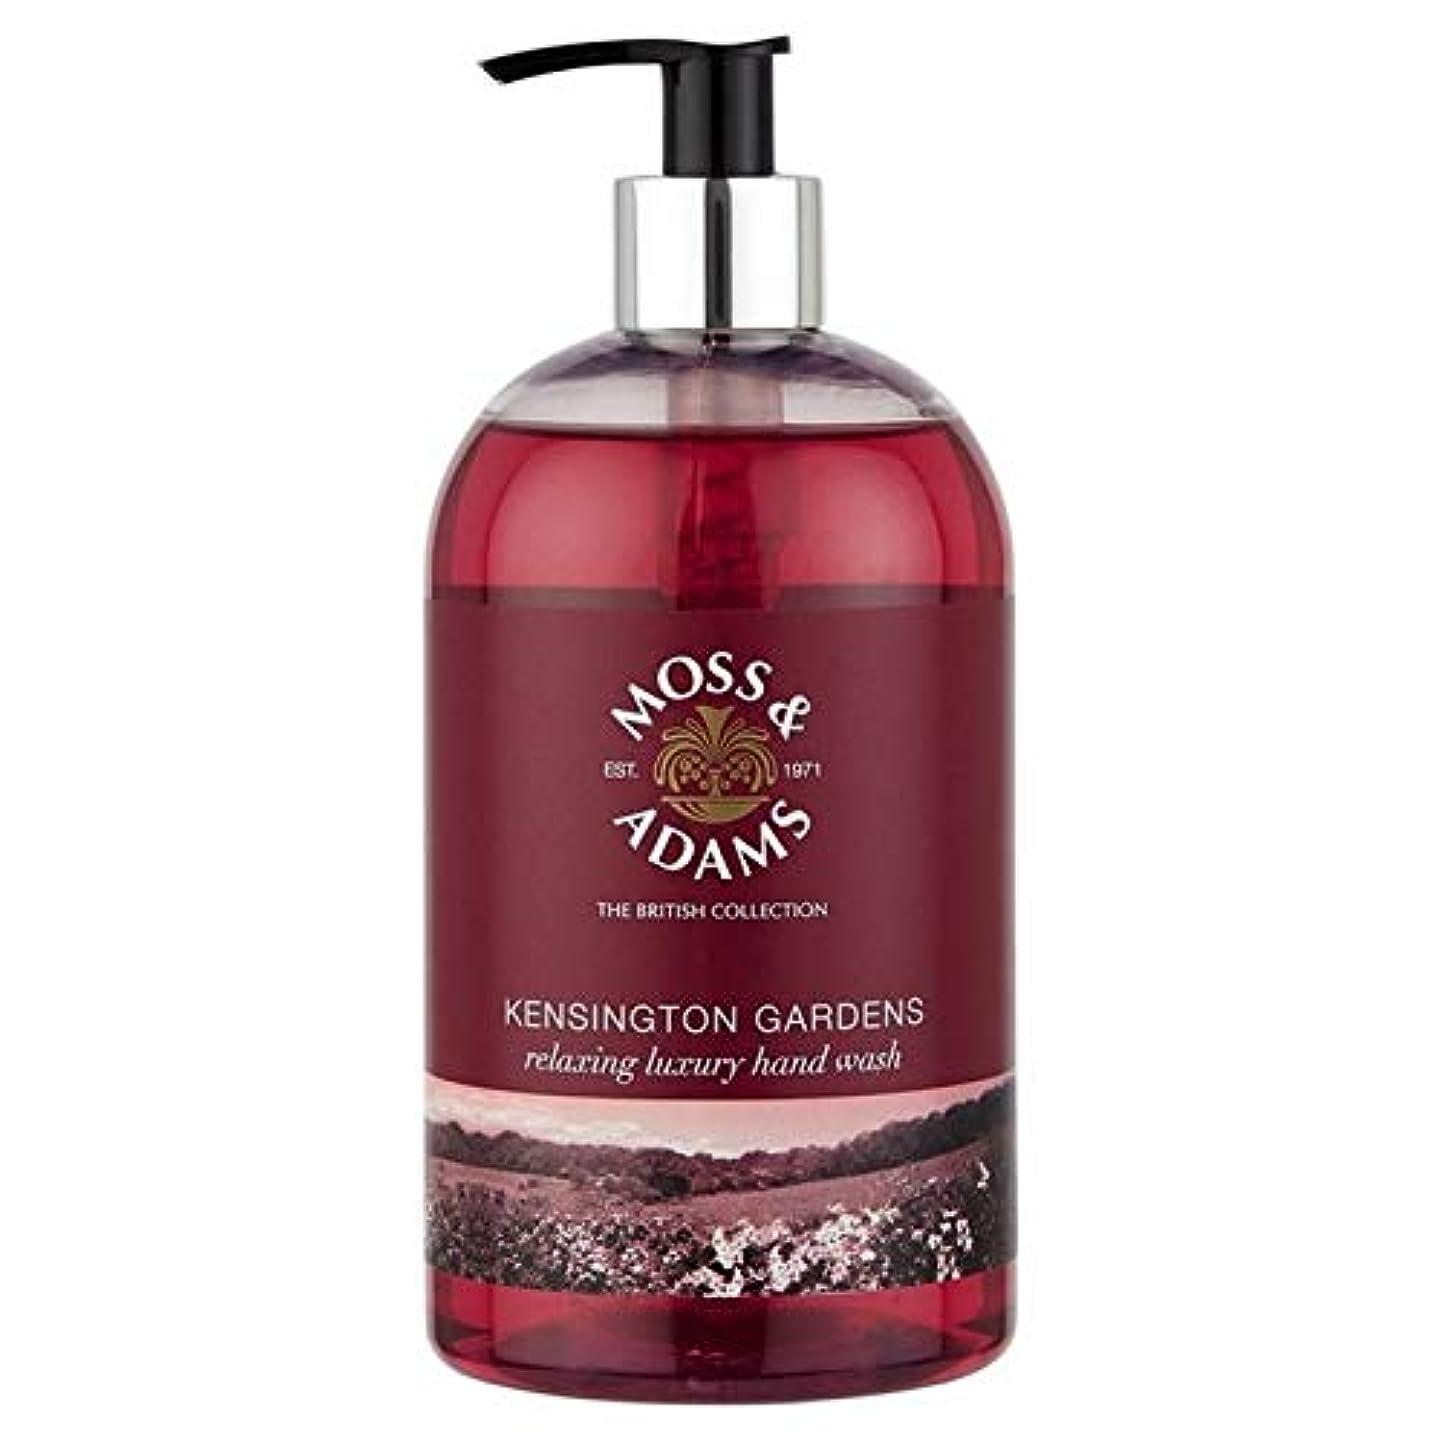 [Moss & Adams ] 苔&アダムスケンジントン?ガーデンズハンドウォッシュ500ミリリットル - Moss & Adams Kensington Gardens Hand Wash 500ml [並行輸入品]